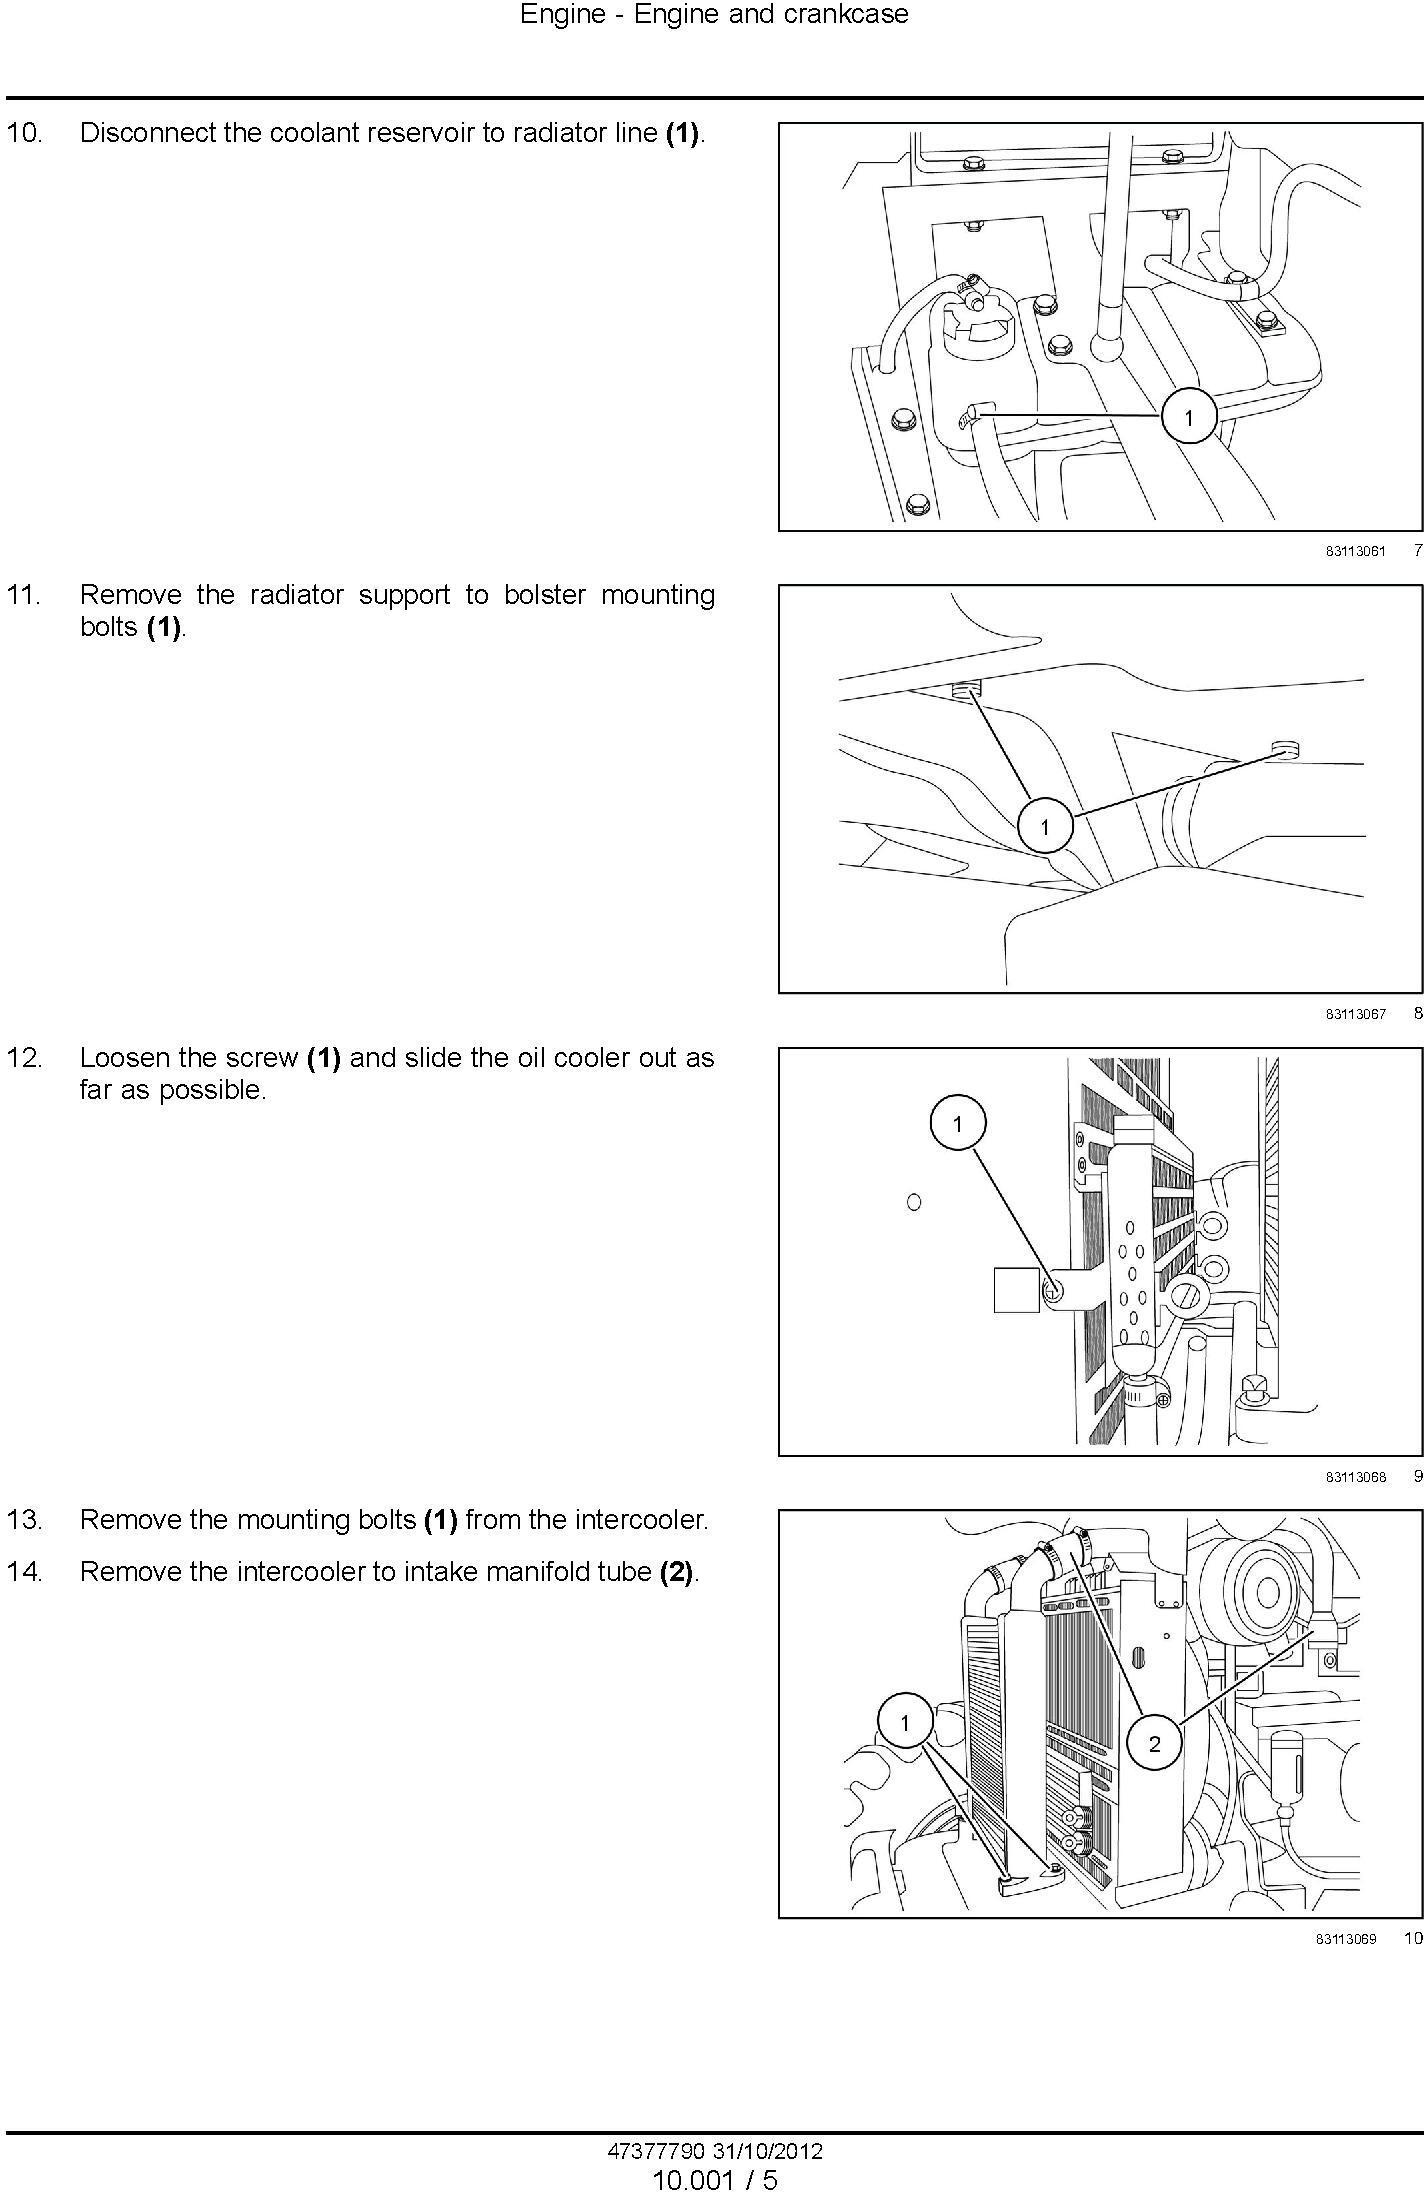 New Holland TS6.110 (HC), TS6.120, TS6.120HC, TS6.125, TS6.140 Tractor Complete Service Manual - 1